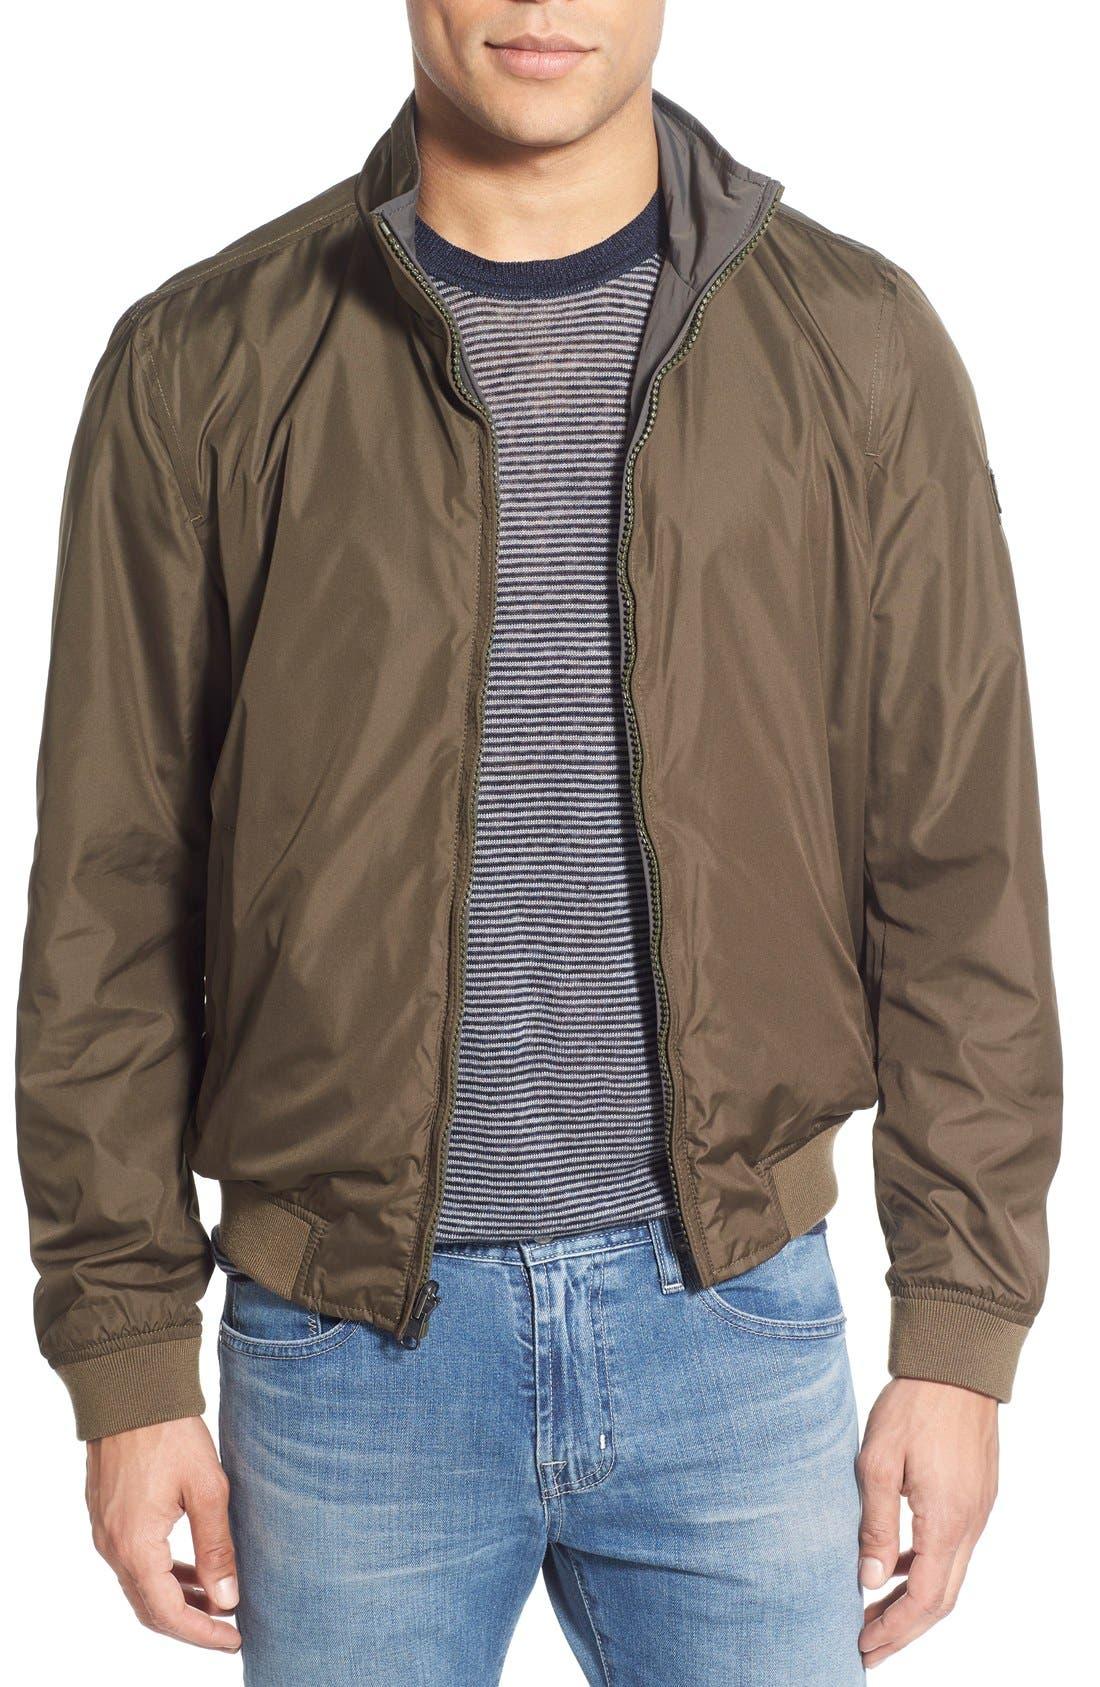 John Rich Reversible Jacket,                         Main,                         color, 308